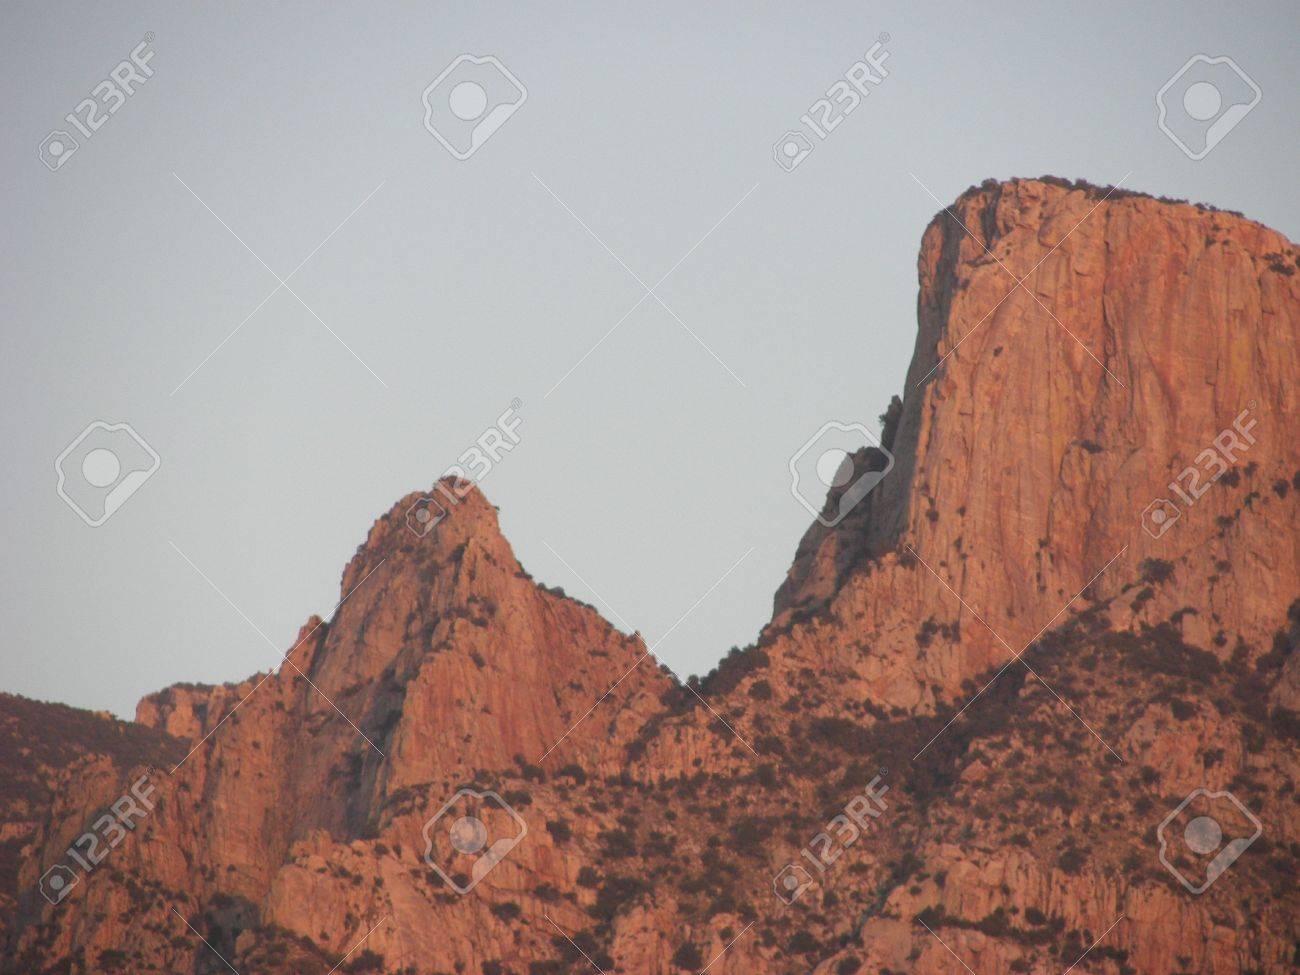 Santa Catalina Mountains in Tucson, AZ at Sunset Stock Photo - 18408955